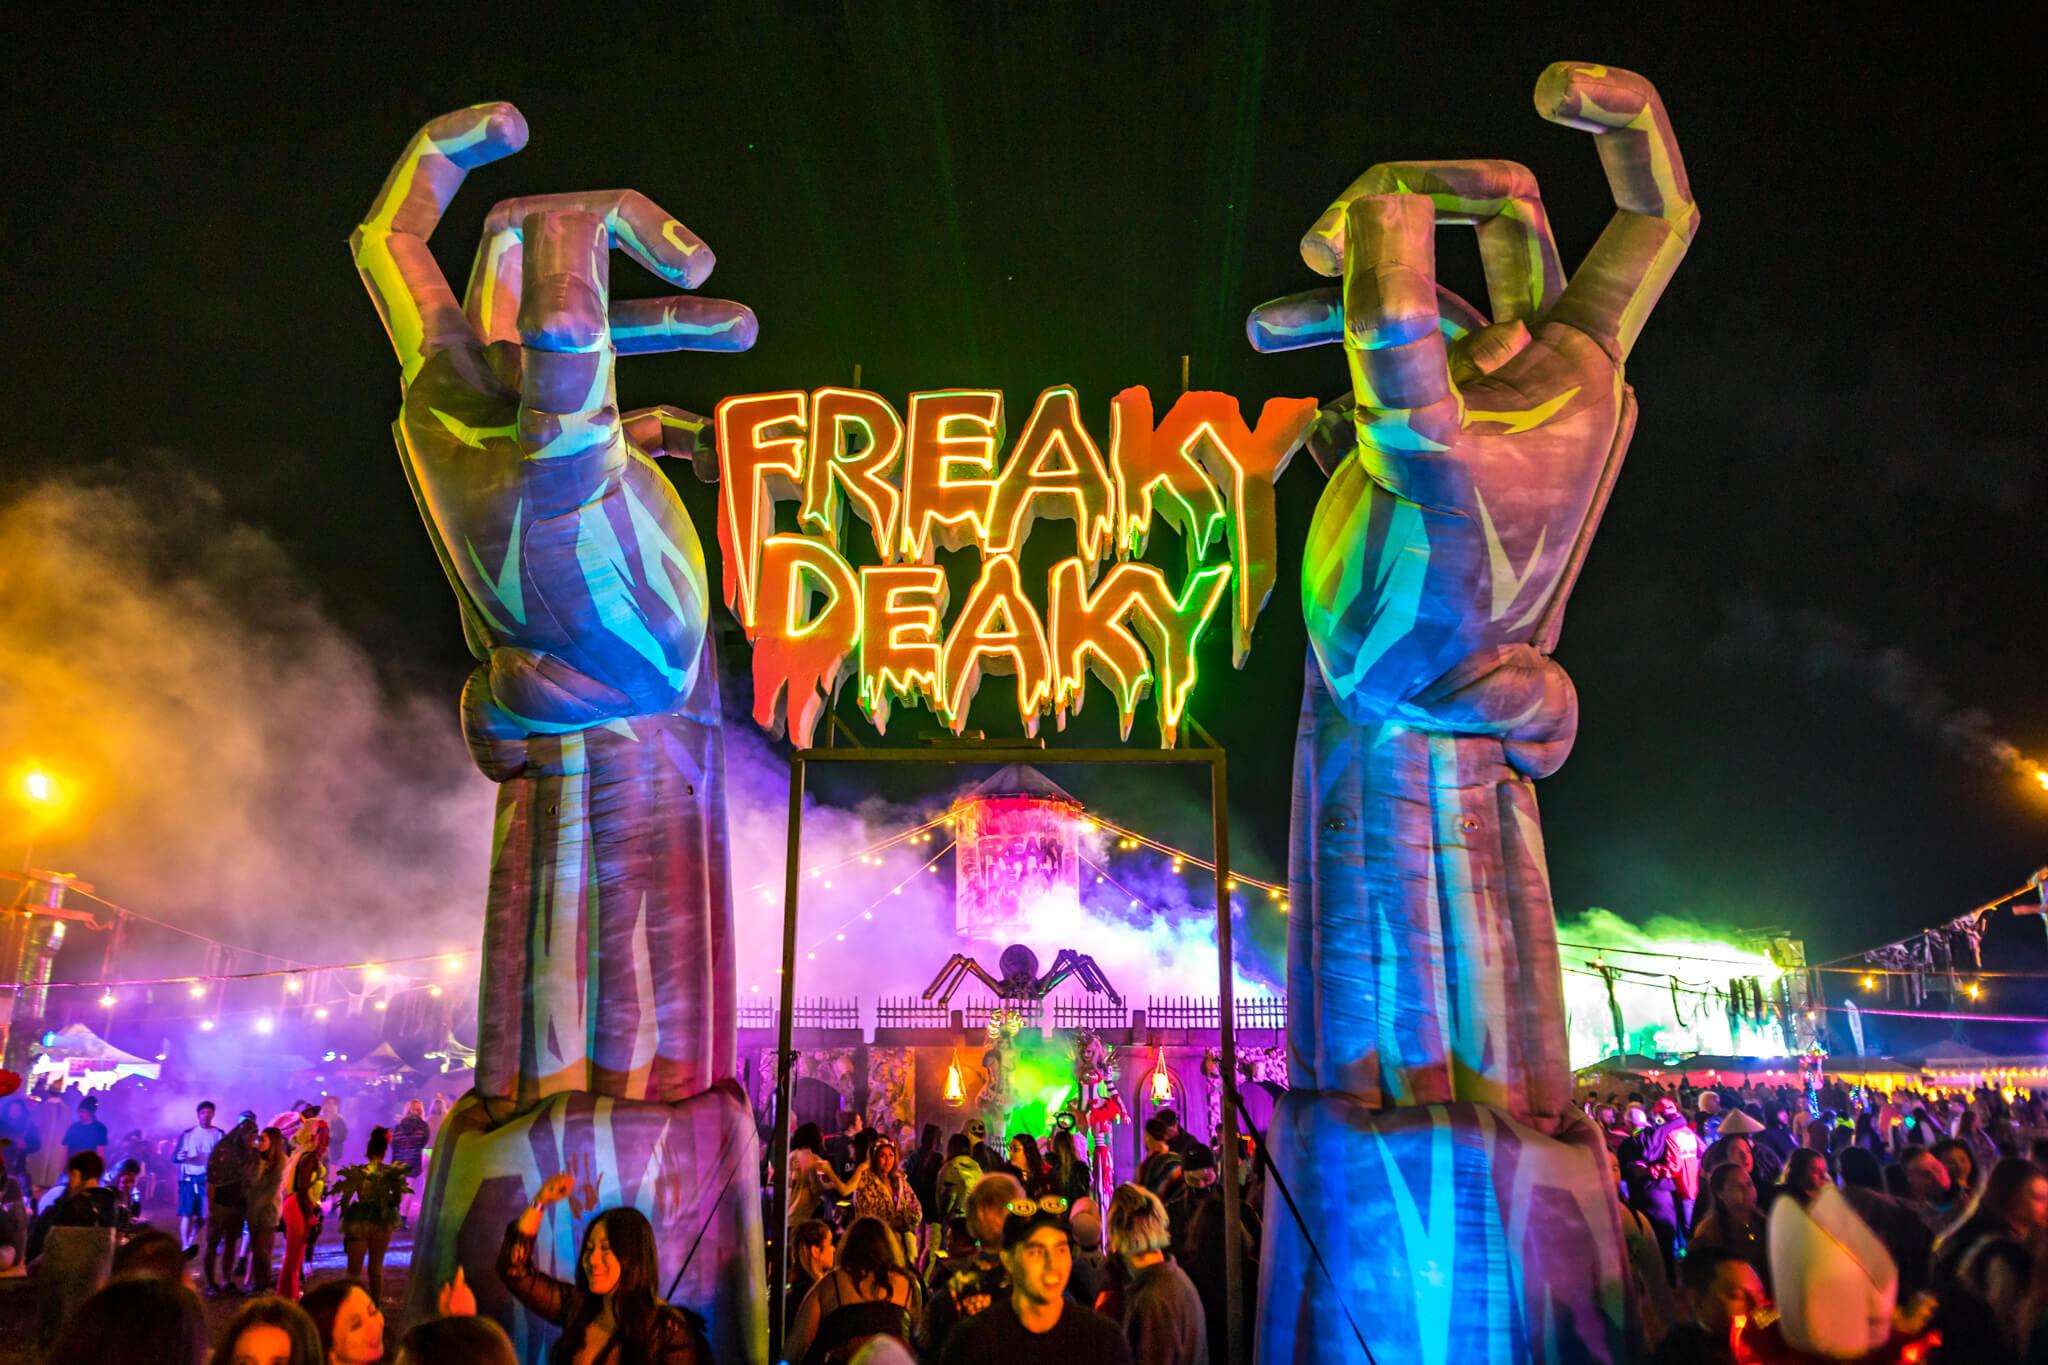 Freaky Deaky Festival 2021